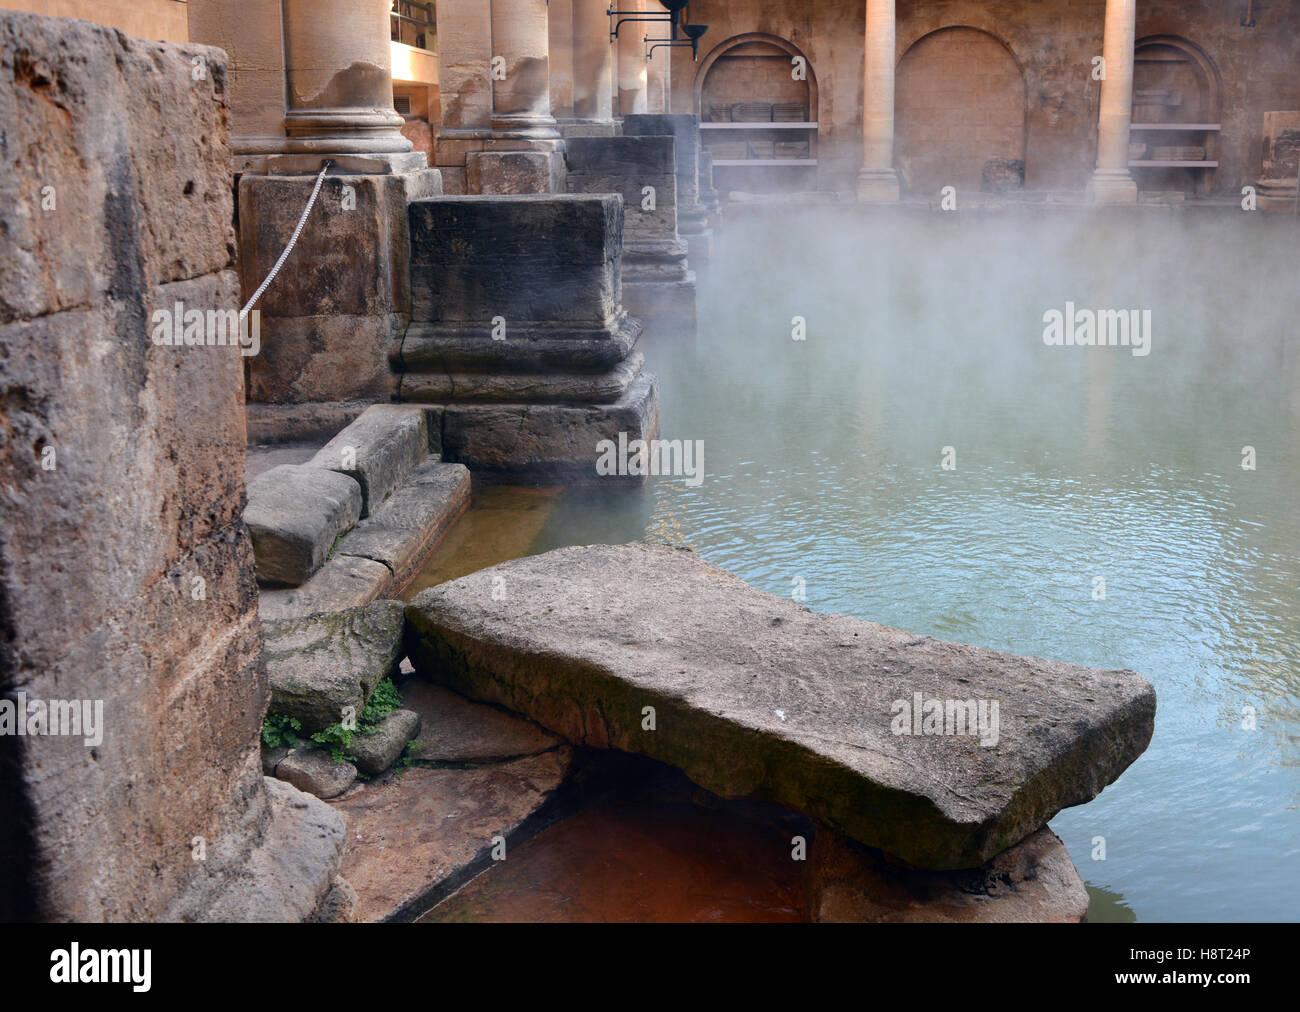 Romano British Stock Photos & Romano British Stock Images - Alamy